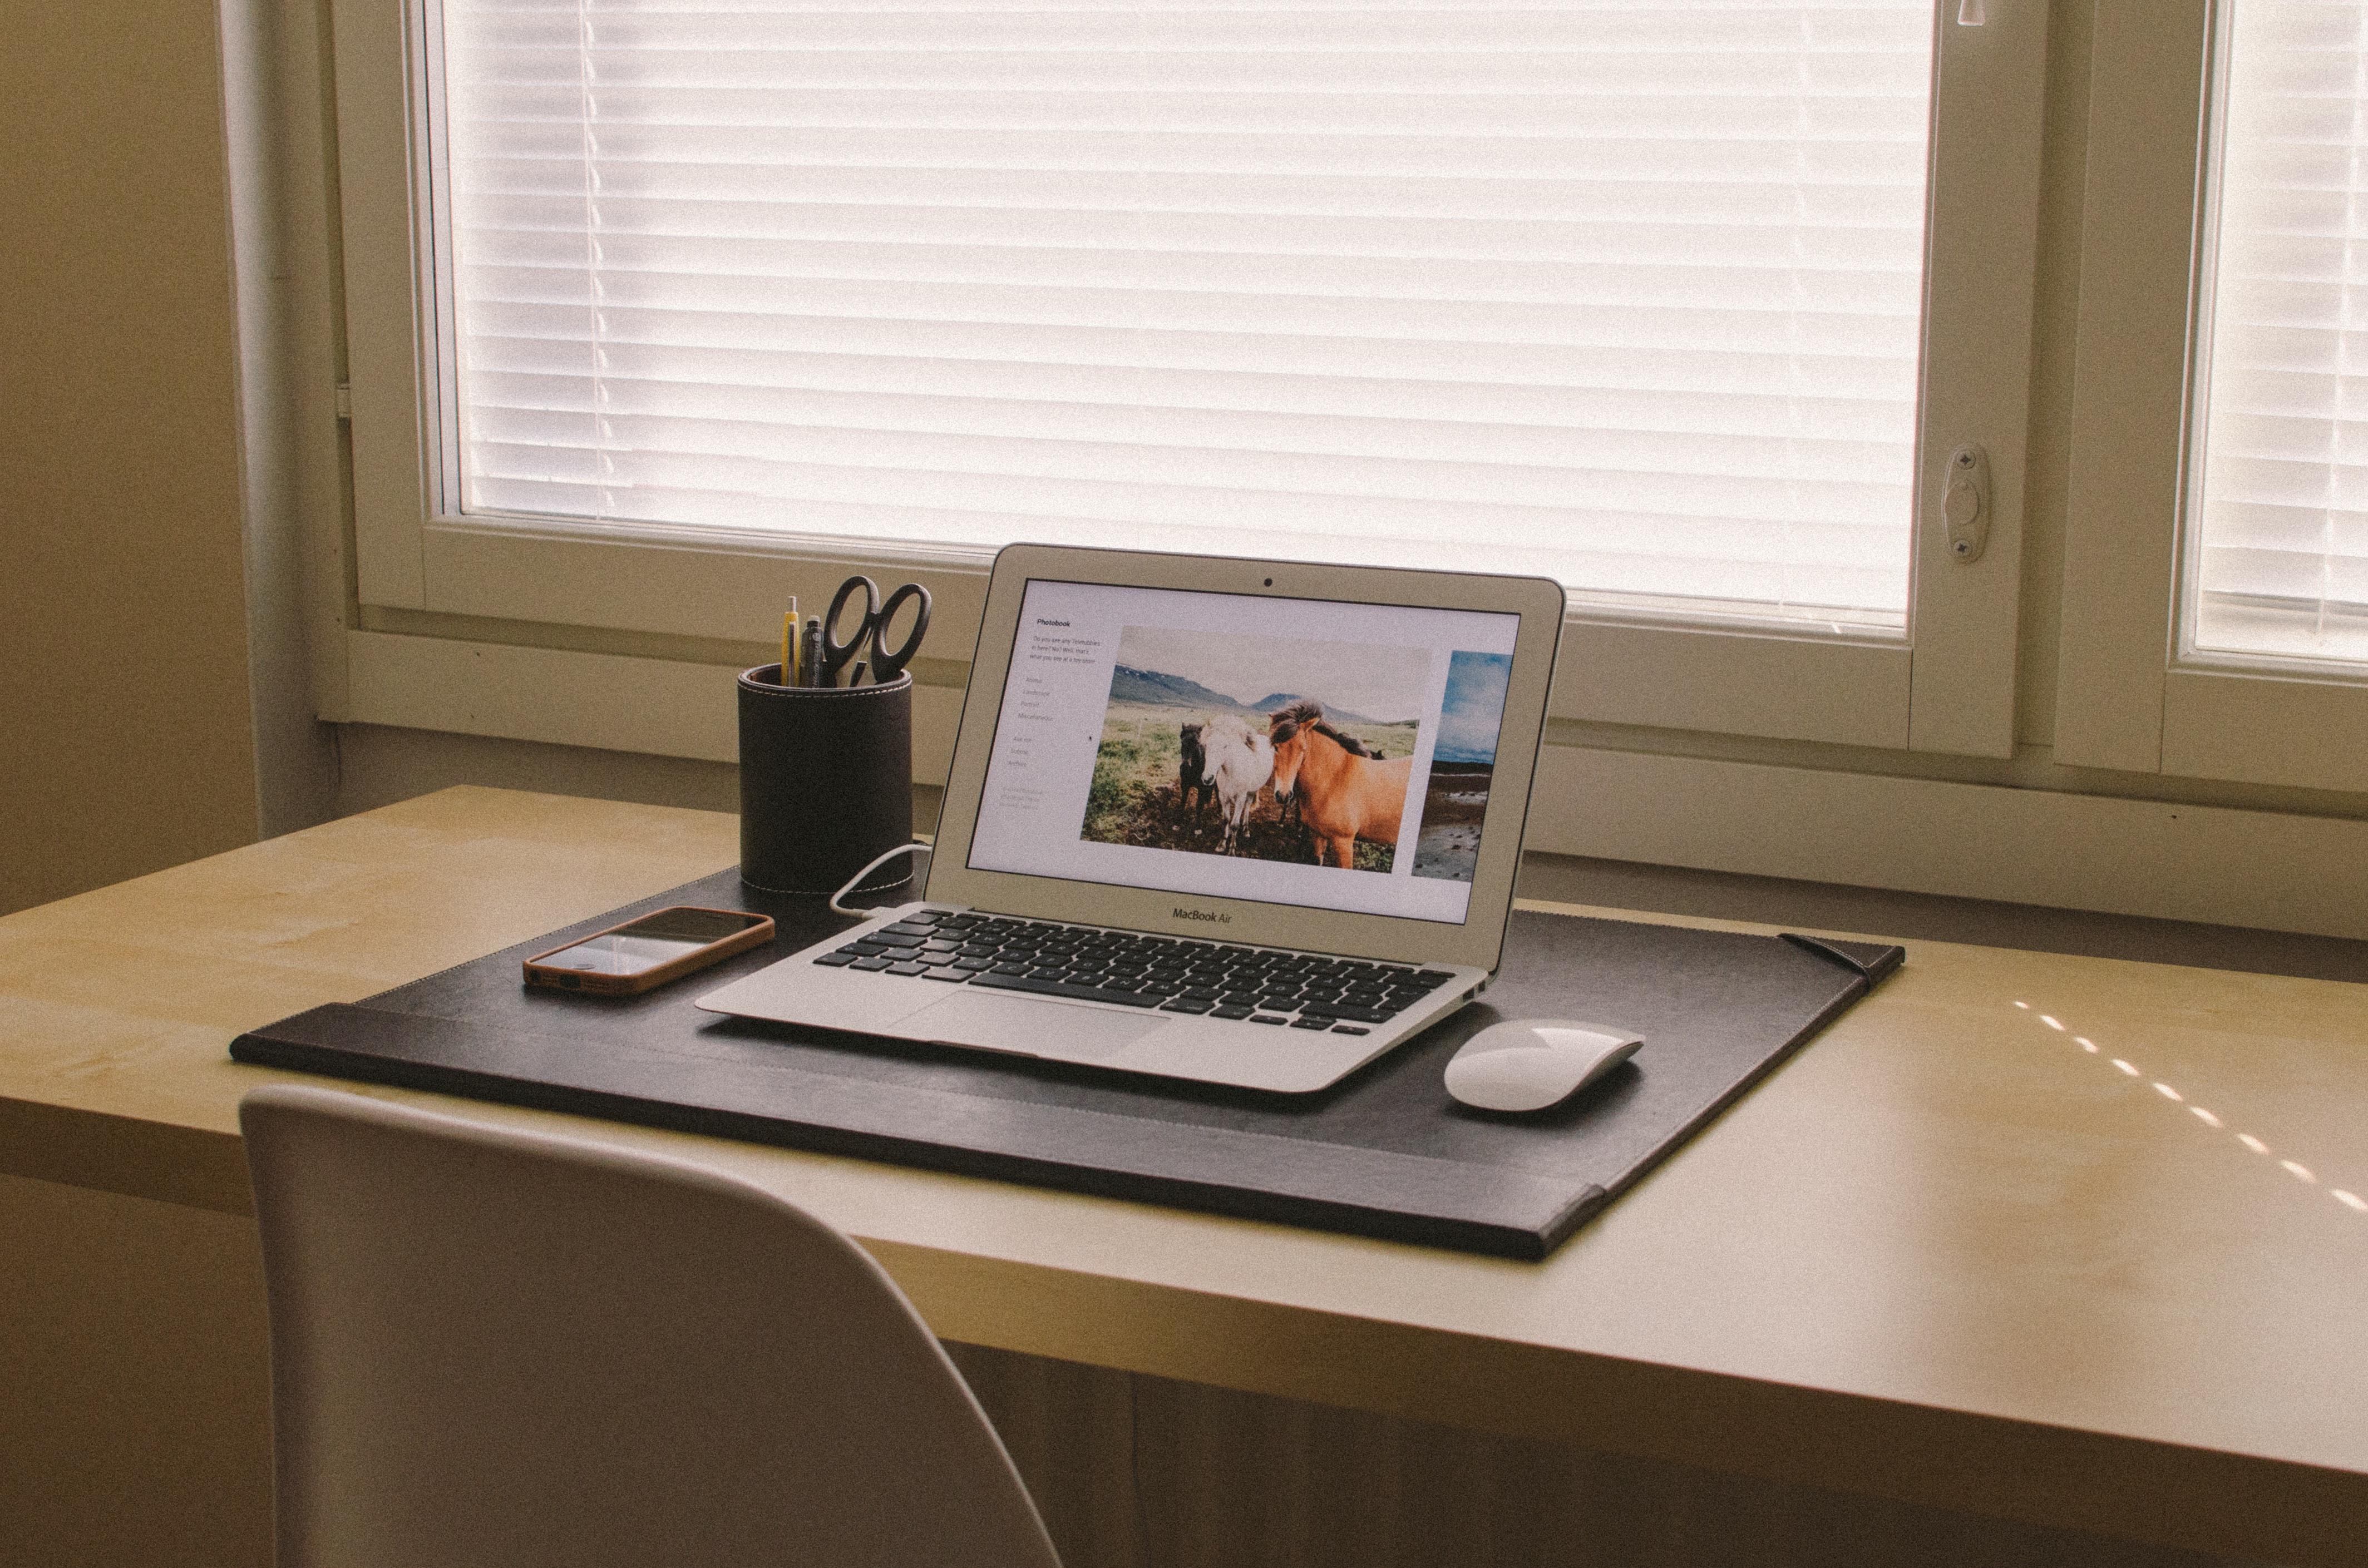 Free Images : laptop, desk, macbook, apple, table, floor, home ...